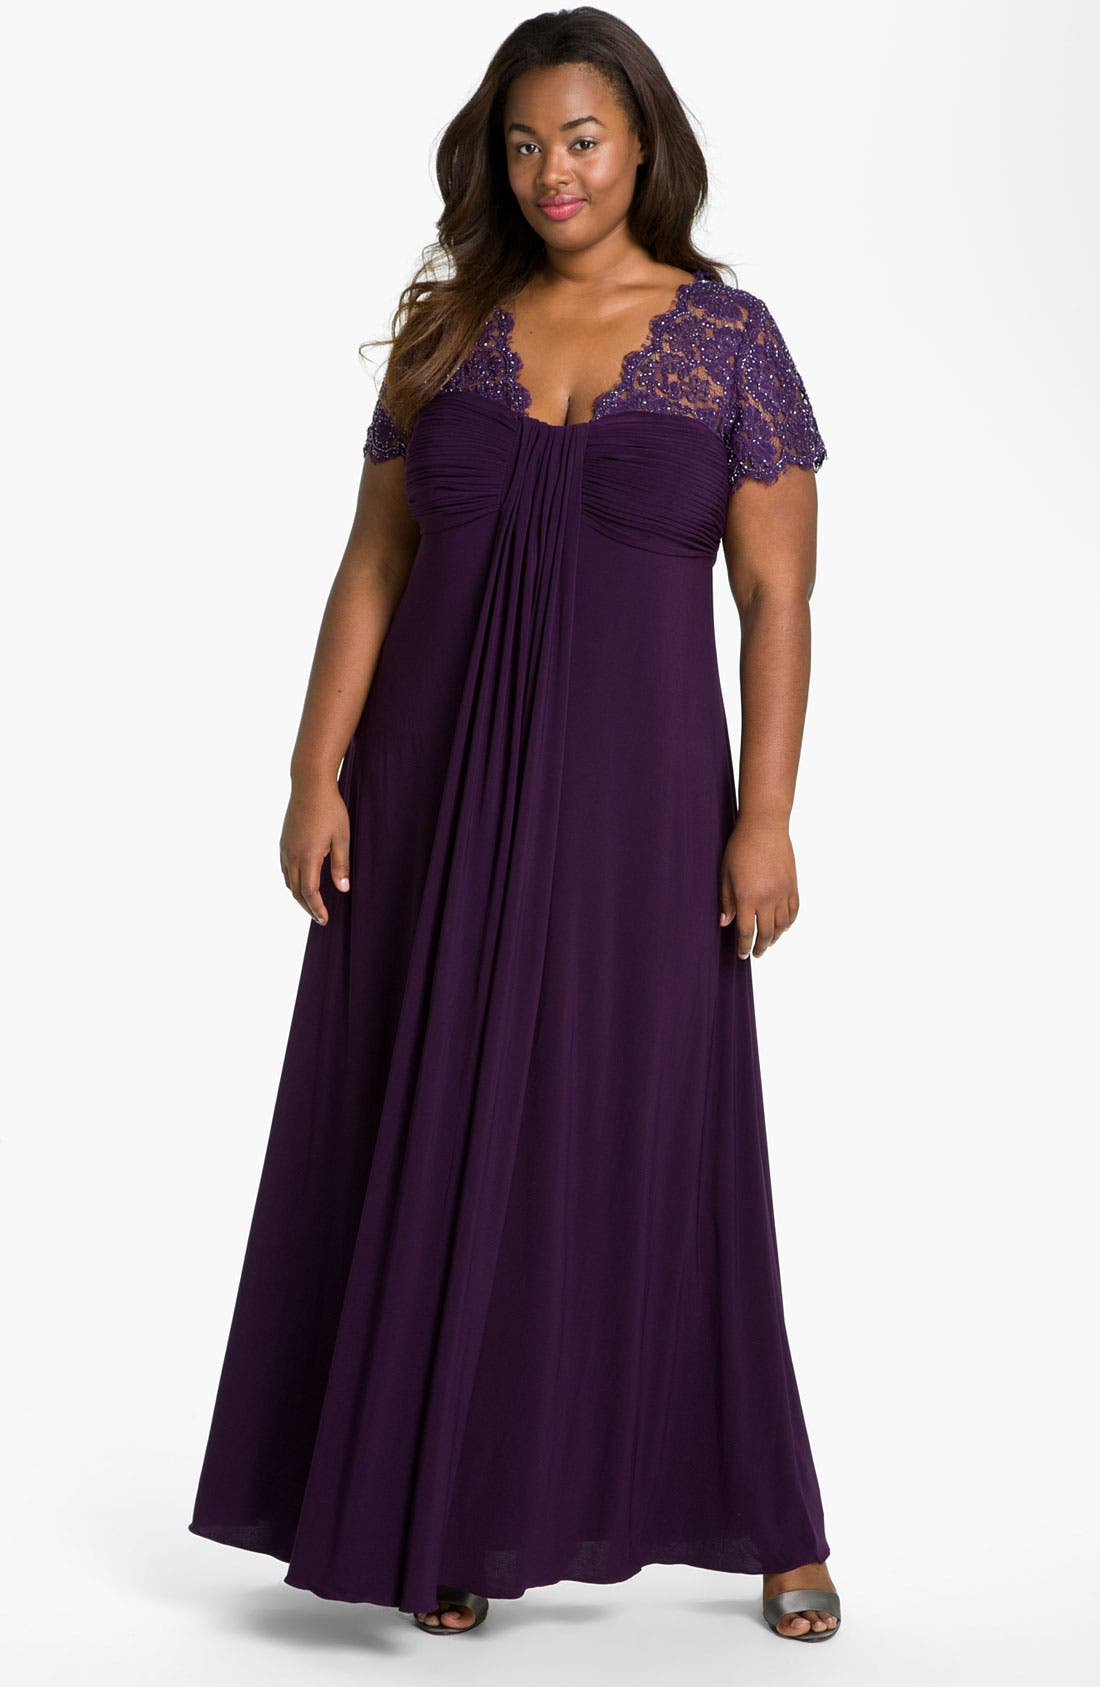 Alternate Image 1 Selected - JS Boutique Beaded Lace & Jersey Dress (Plus)